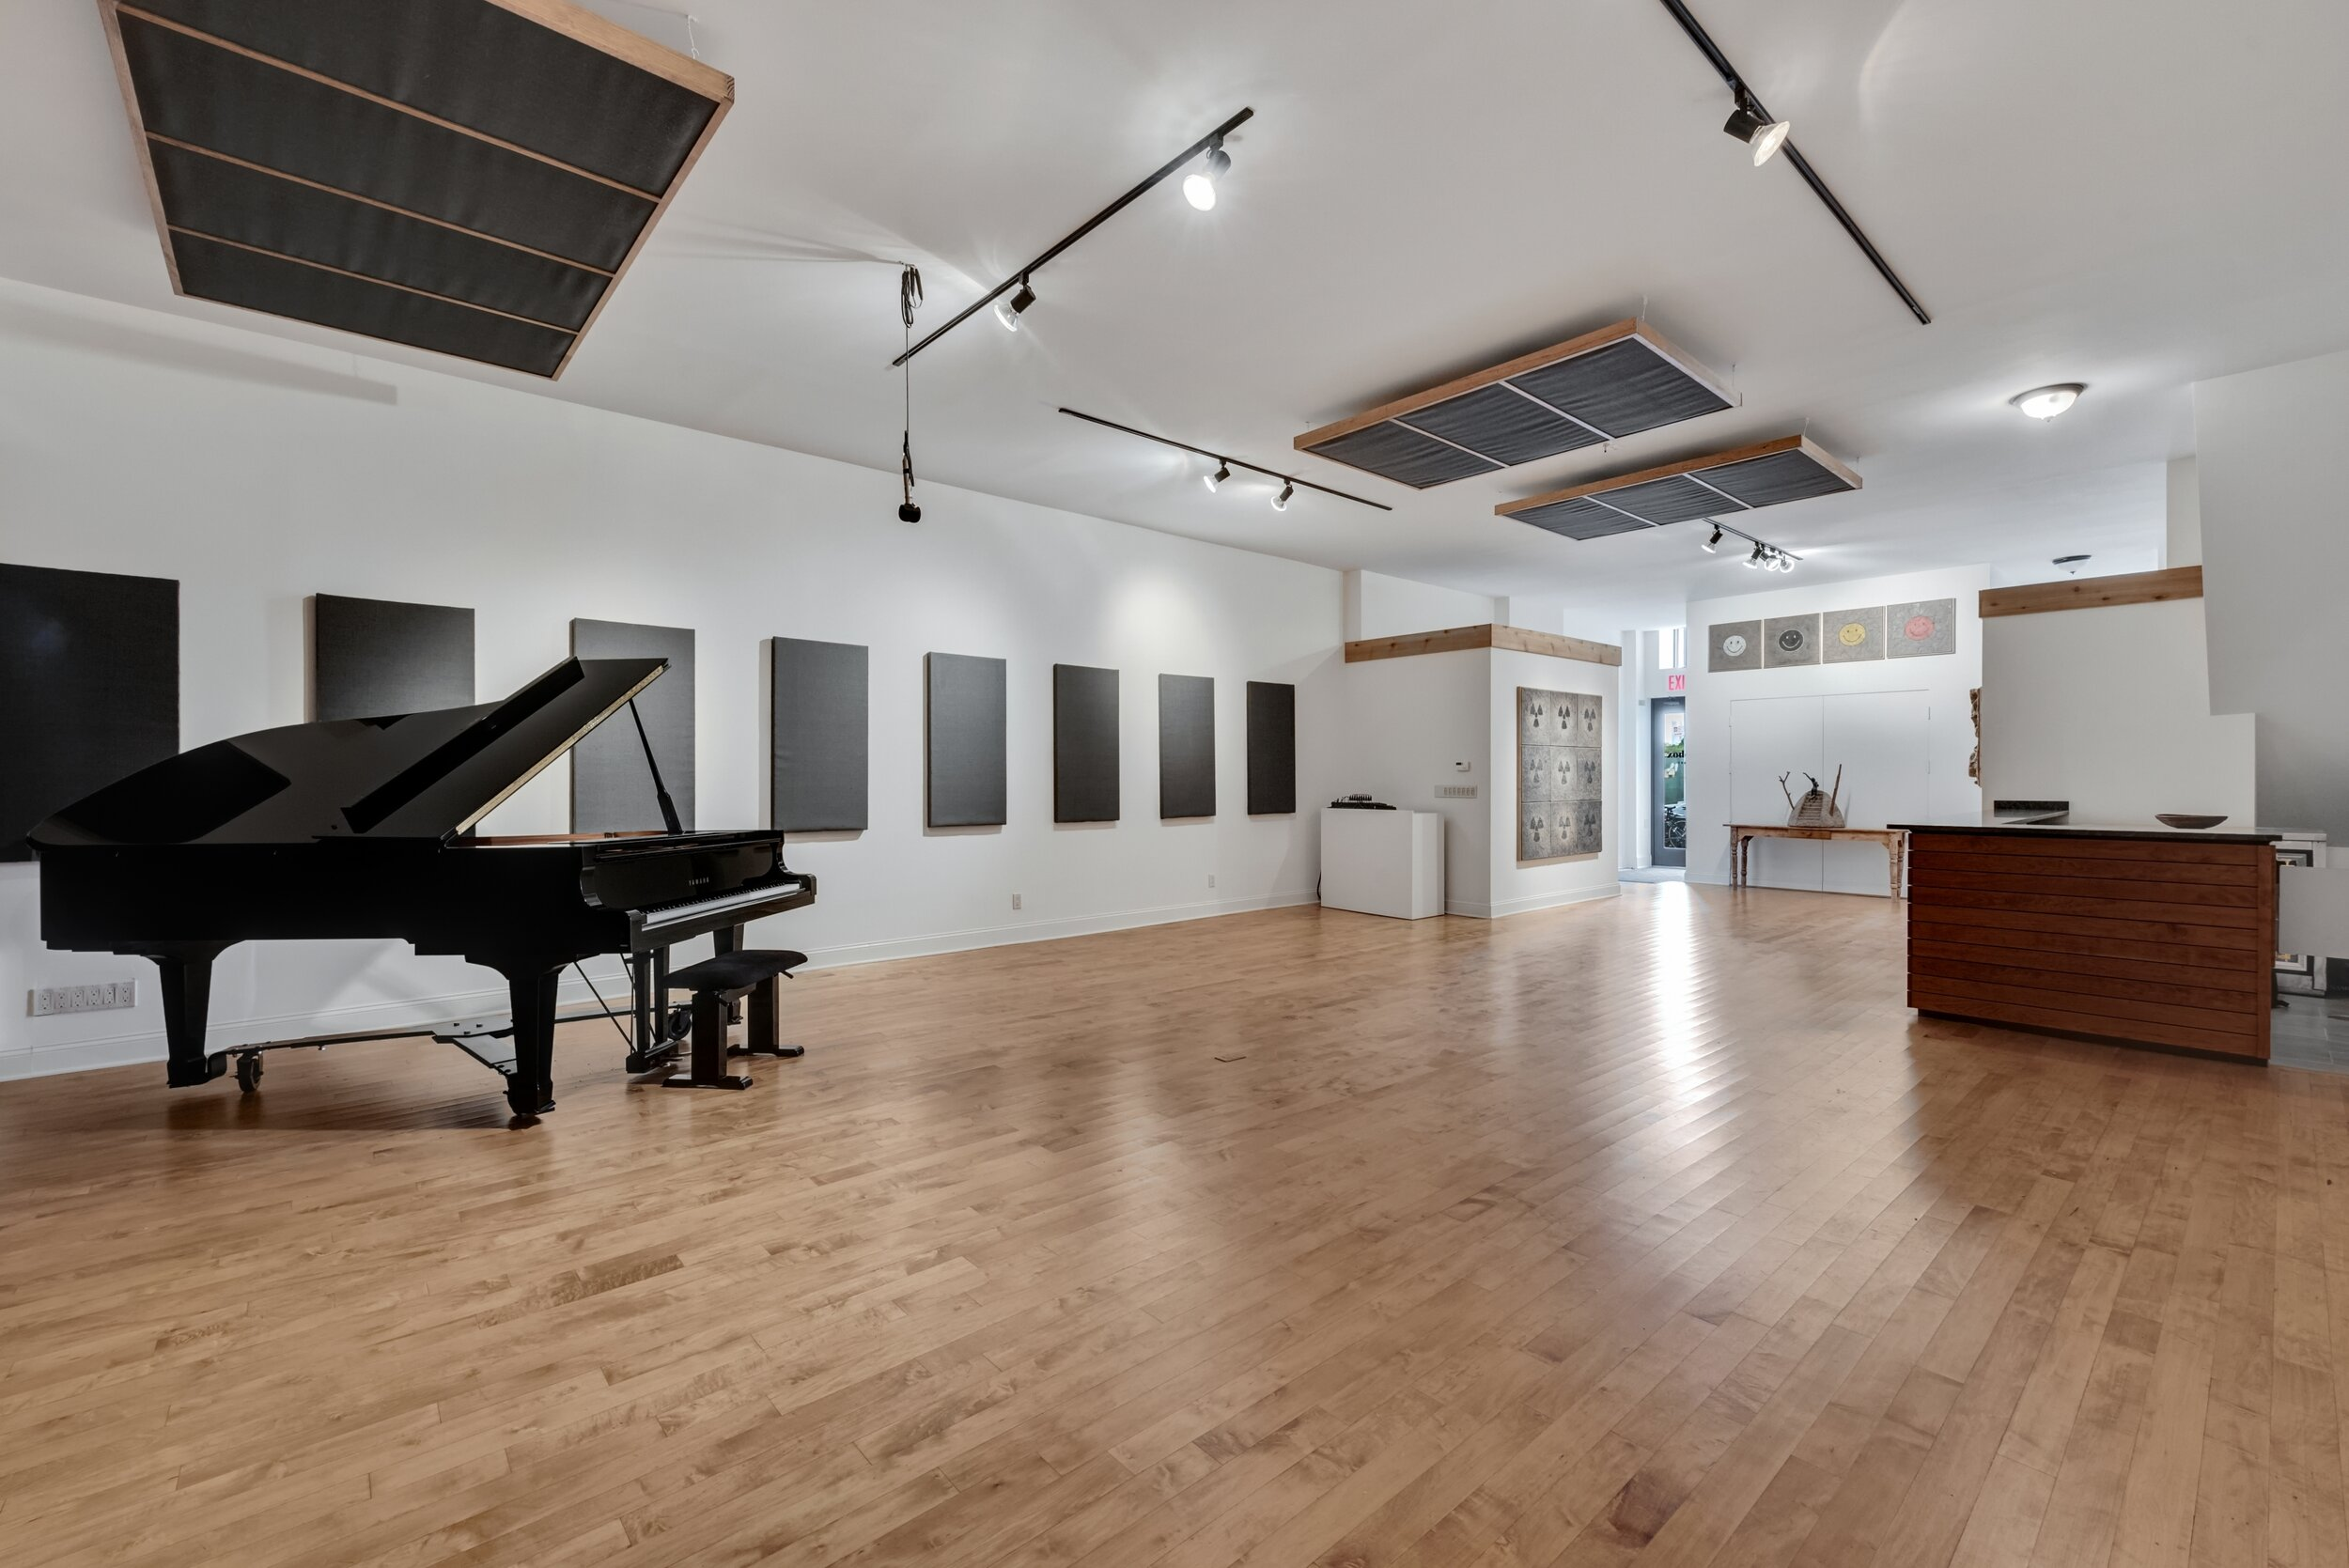 636-dean-street-gallery-003.jpg